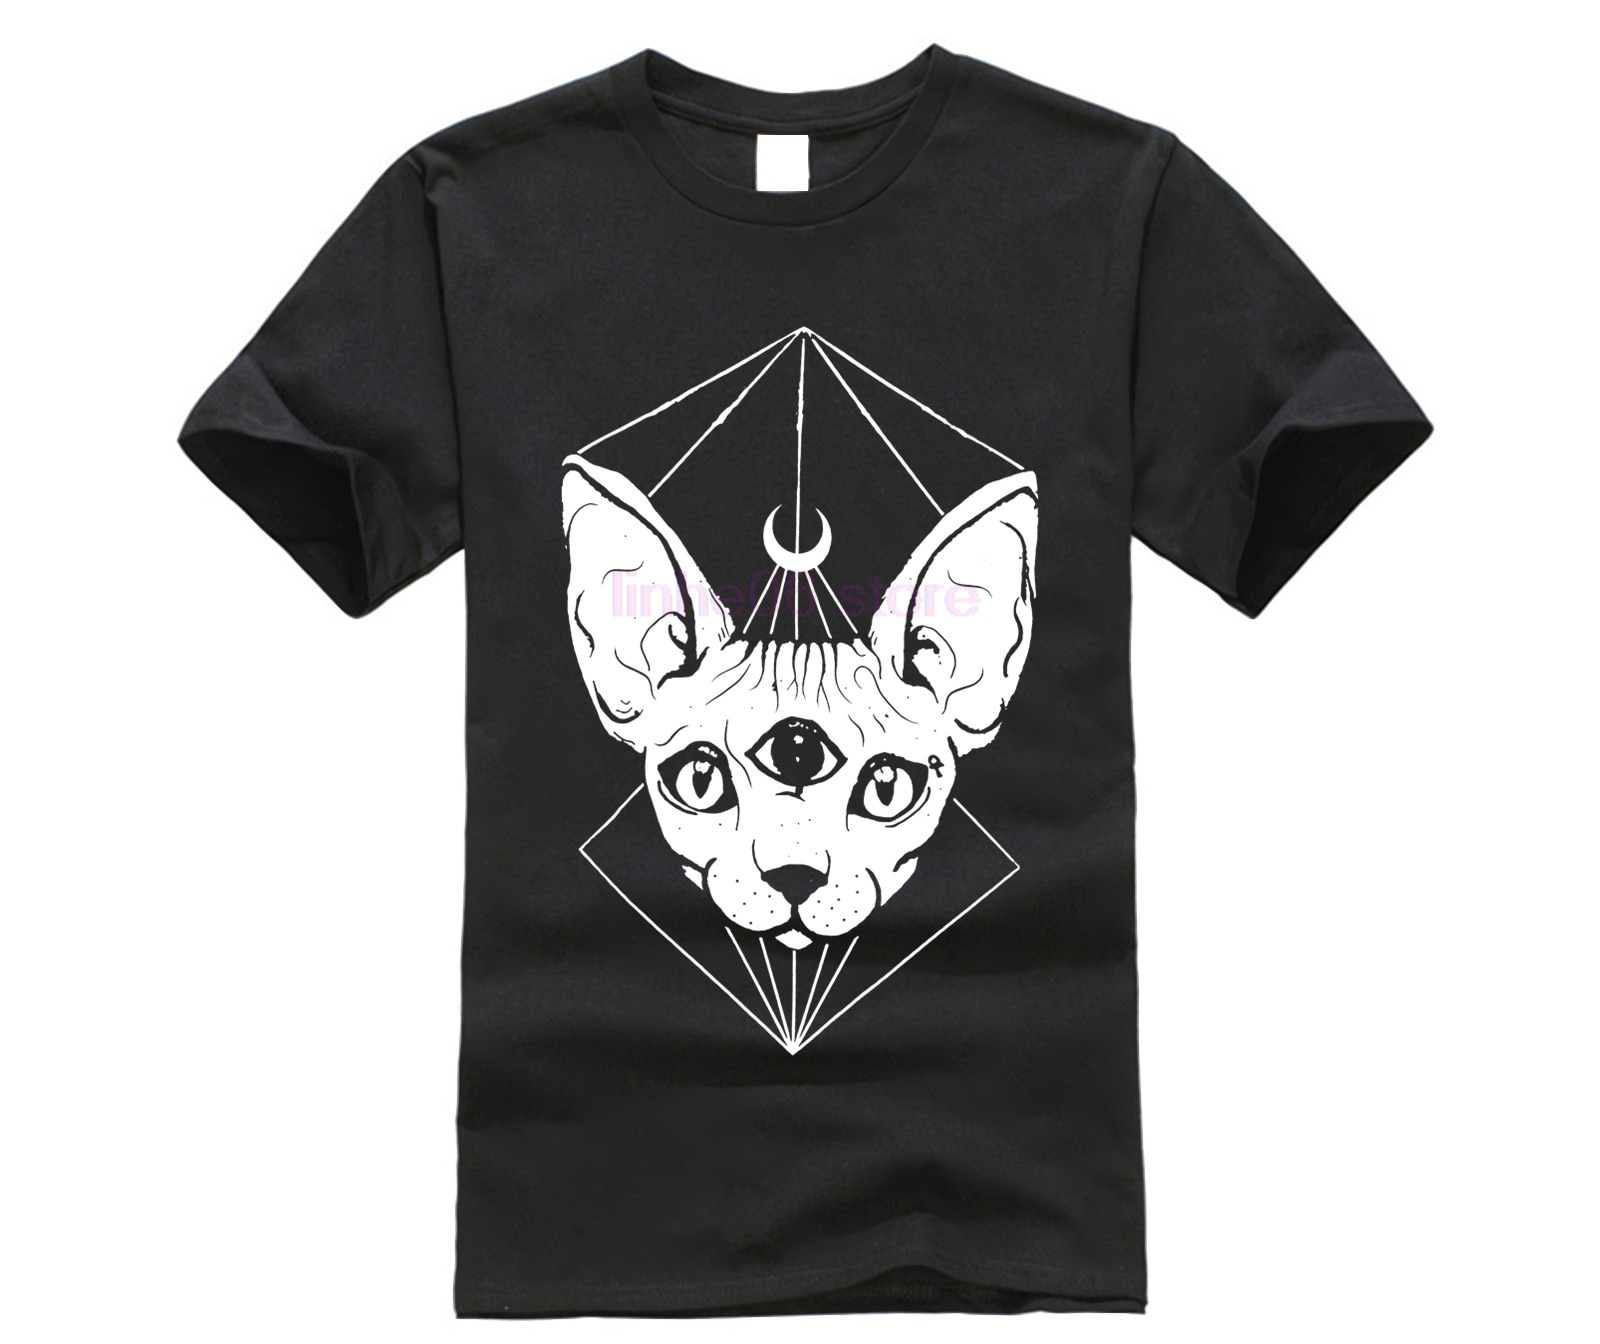 Punk gótico Sphynx cabeza de gato Luna dibujada camisetas negro bruja símbolo camisetas para Goth Cotton Tee Tops